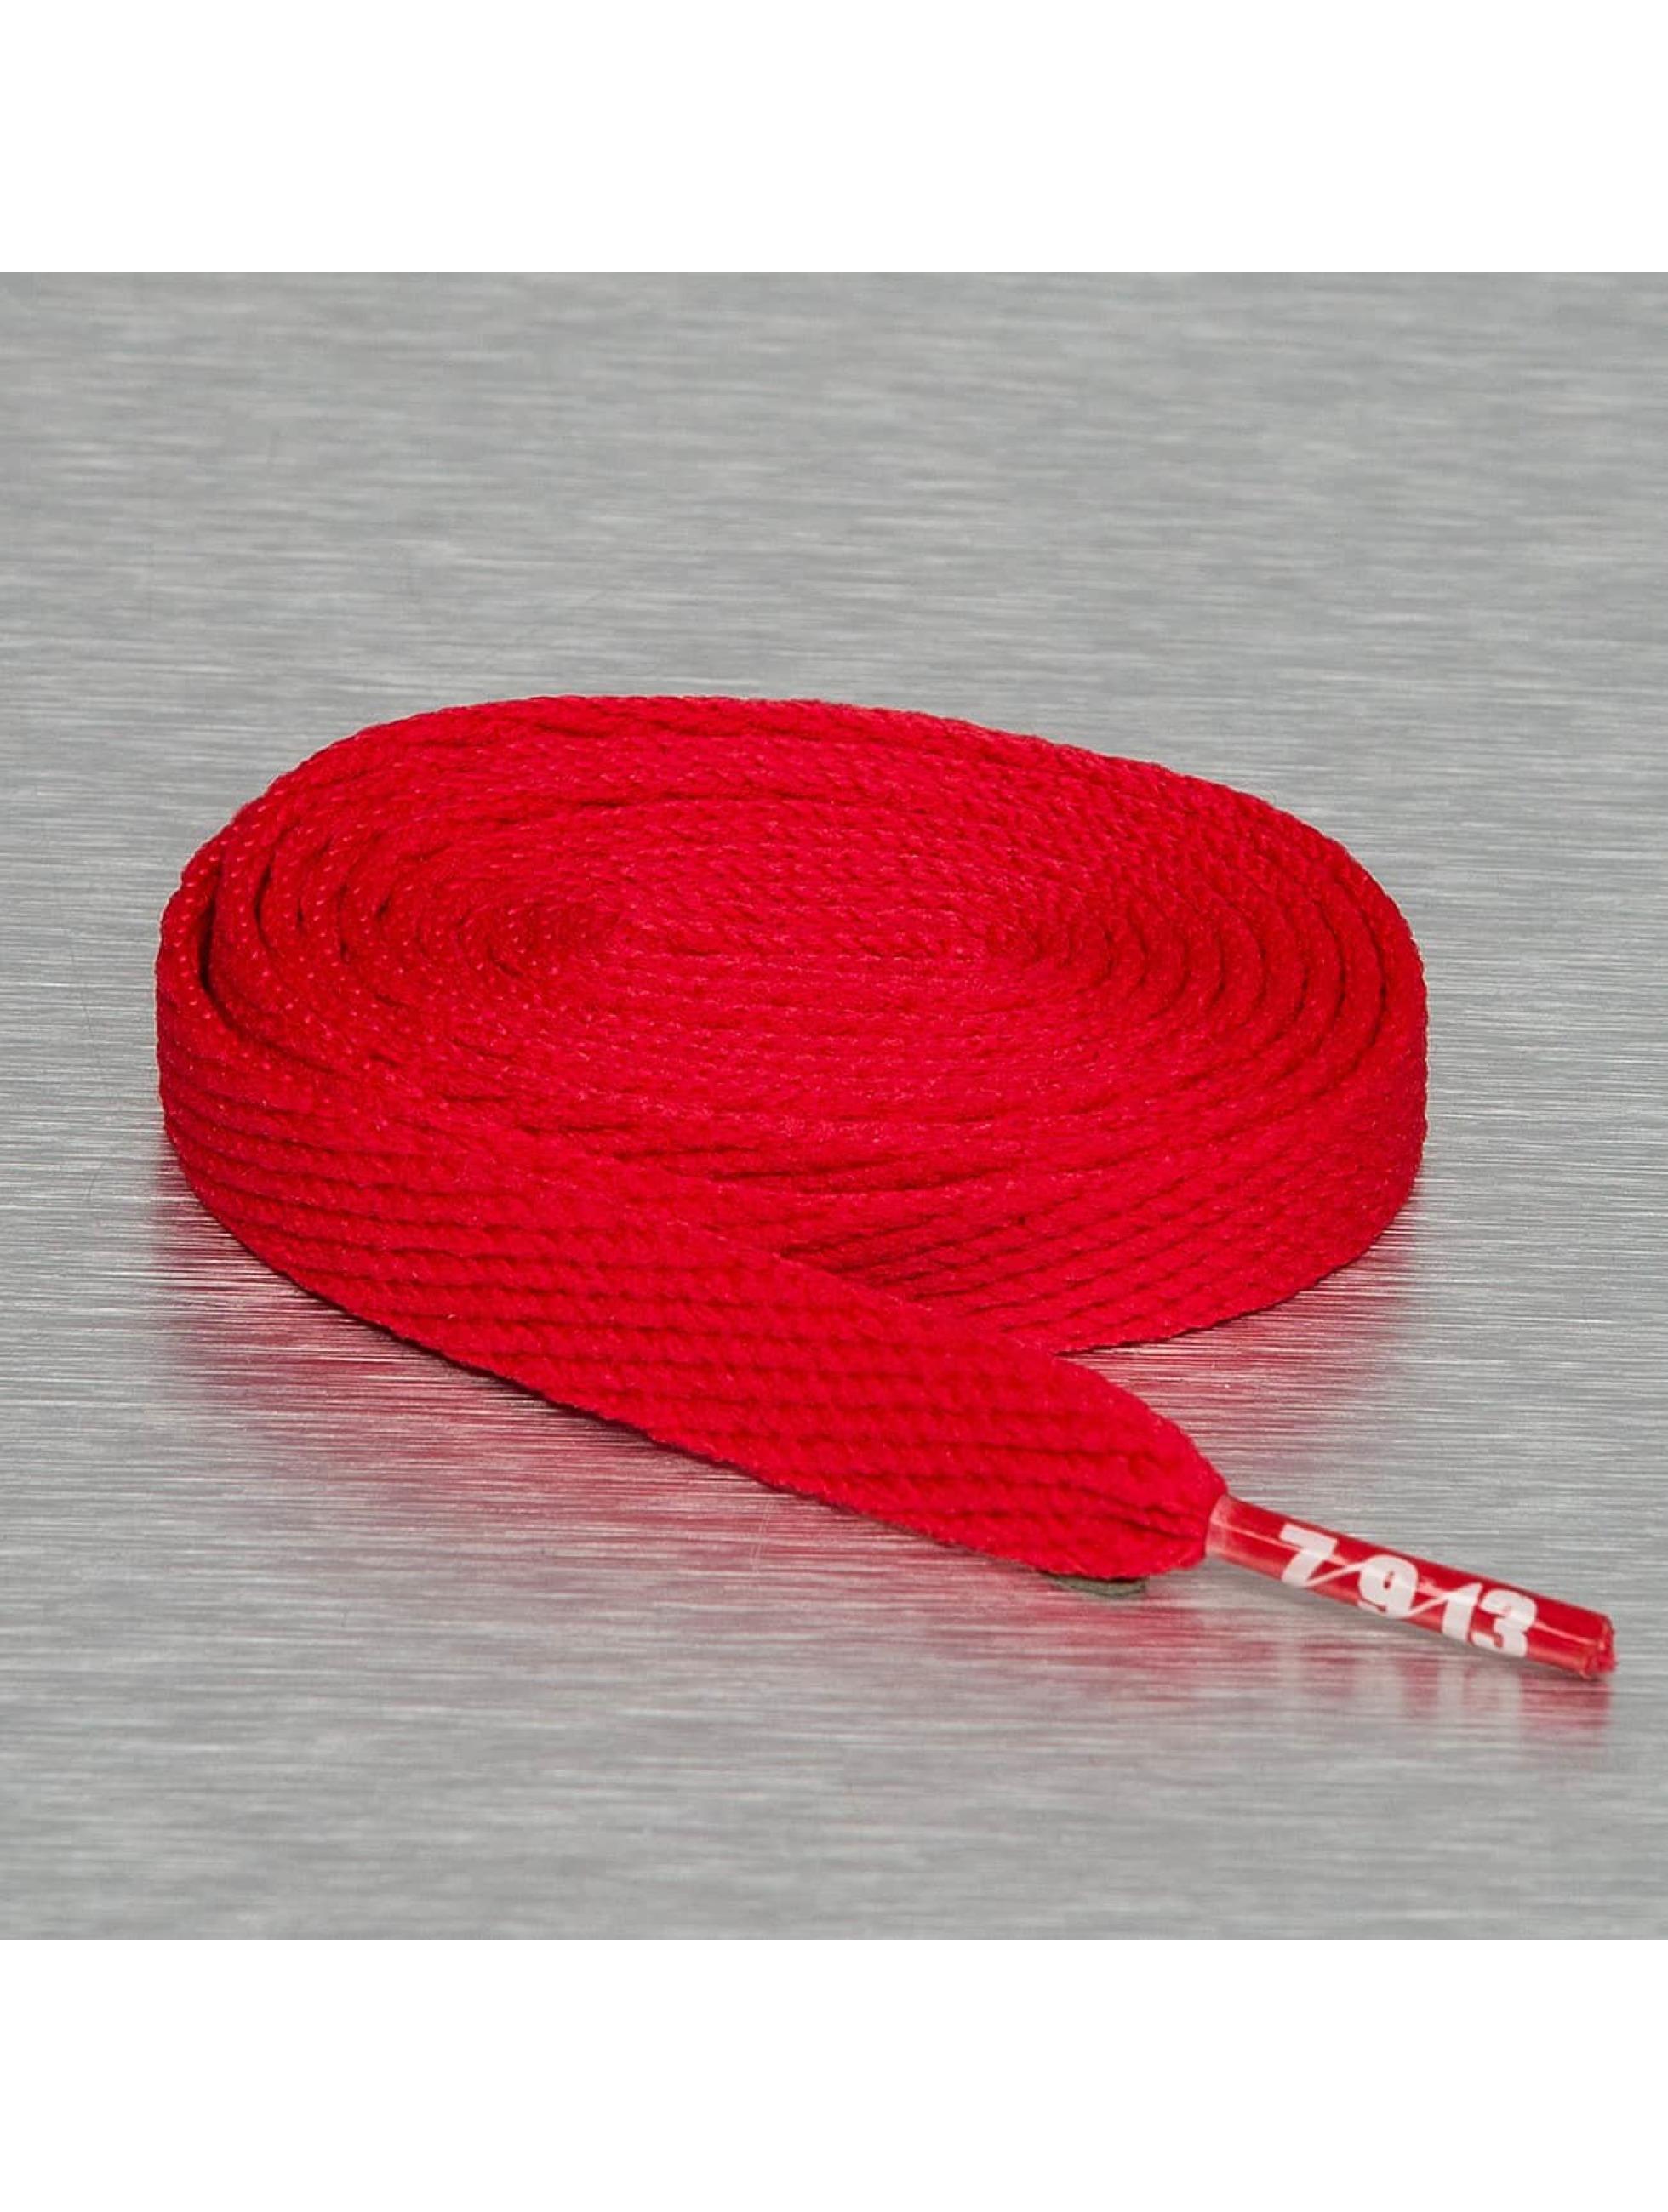 Seven Nine 13 шнурки Hard Candy Flat красный